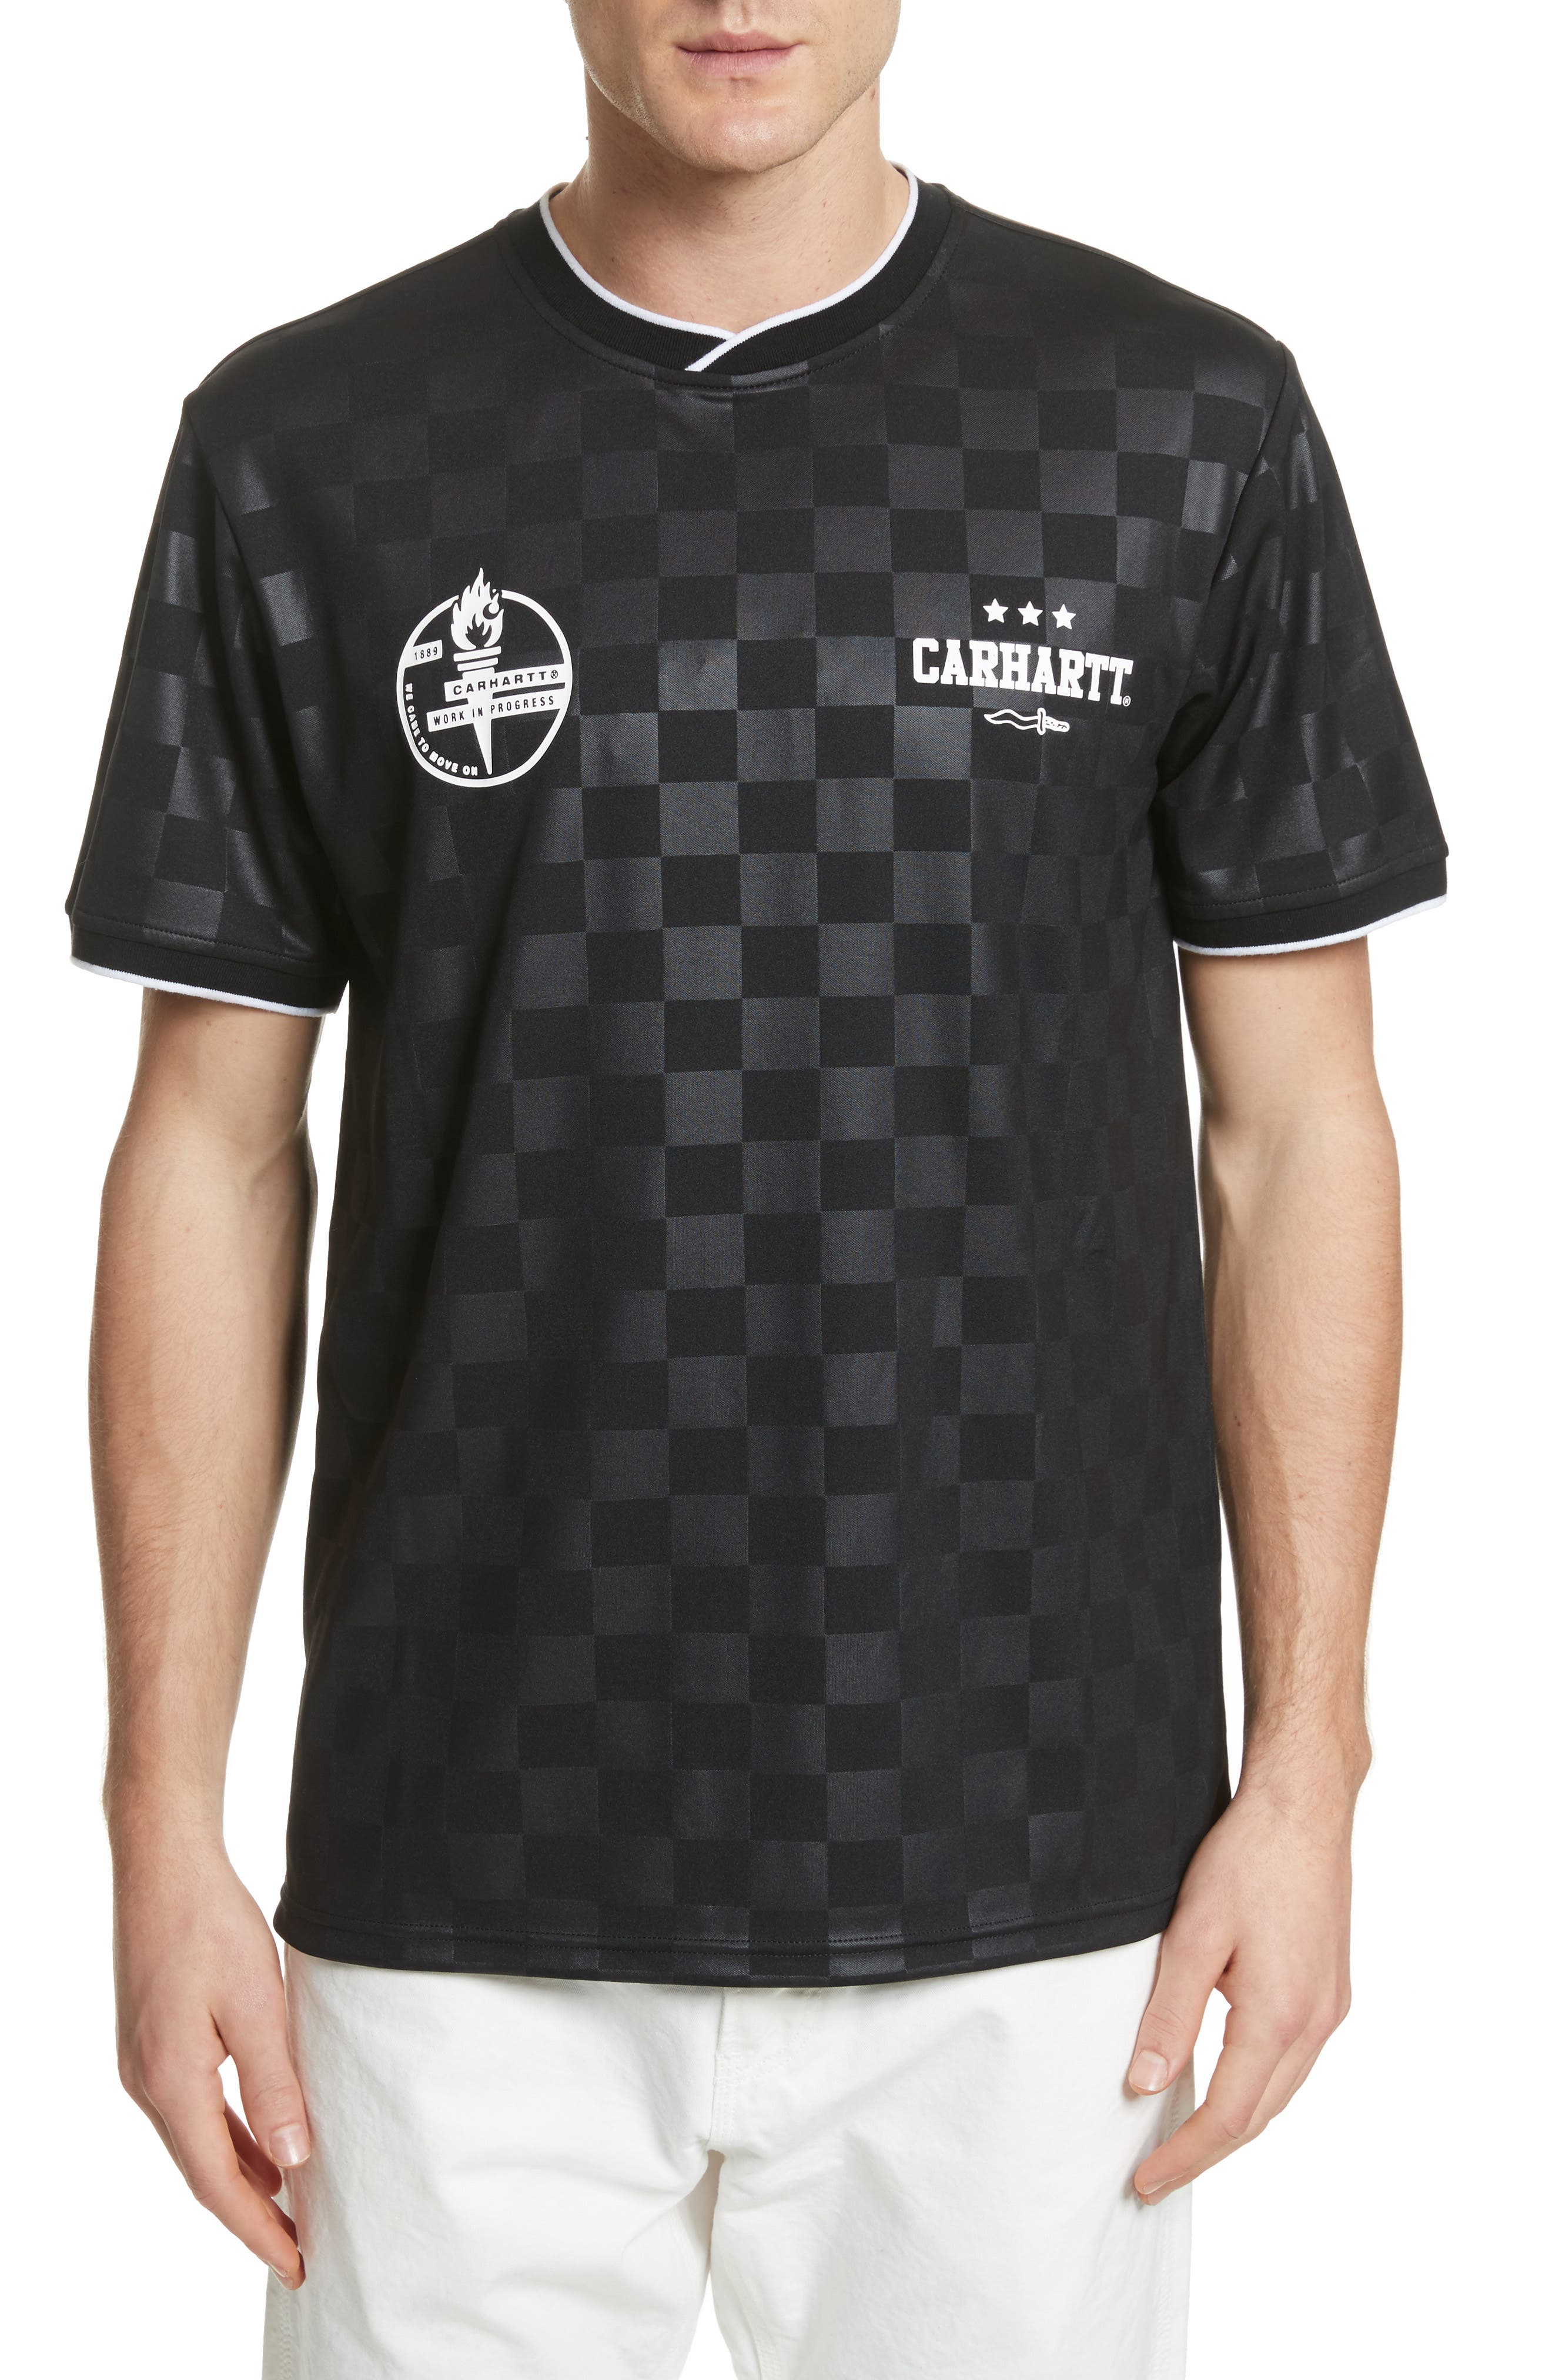 Carhartt Work in Progress Stadium T-Shirt